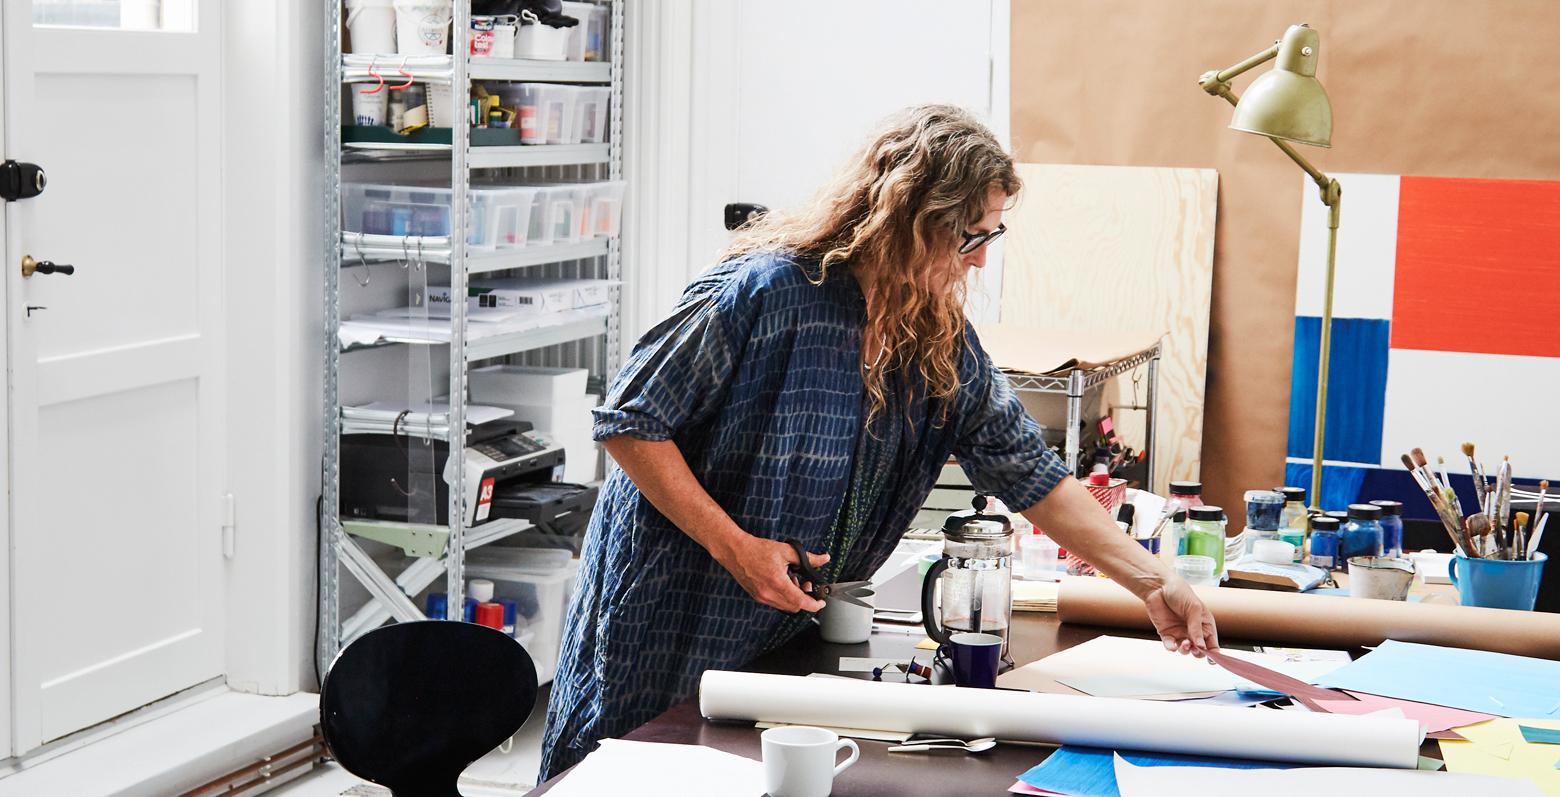 Malene Bach visual artist studio